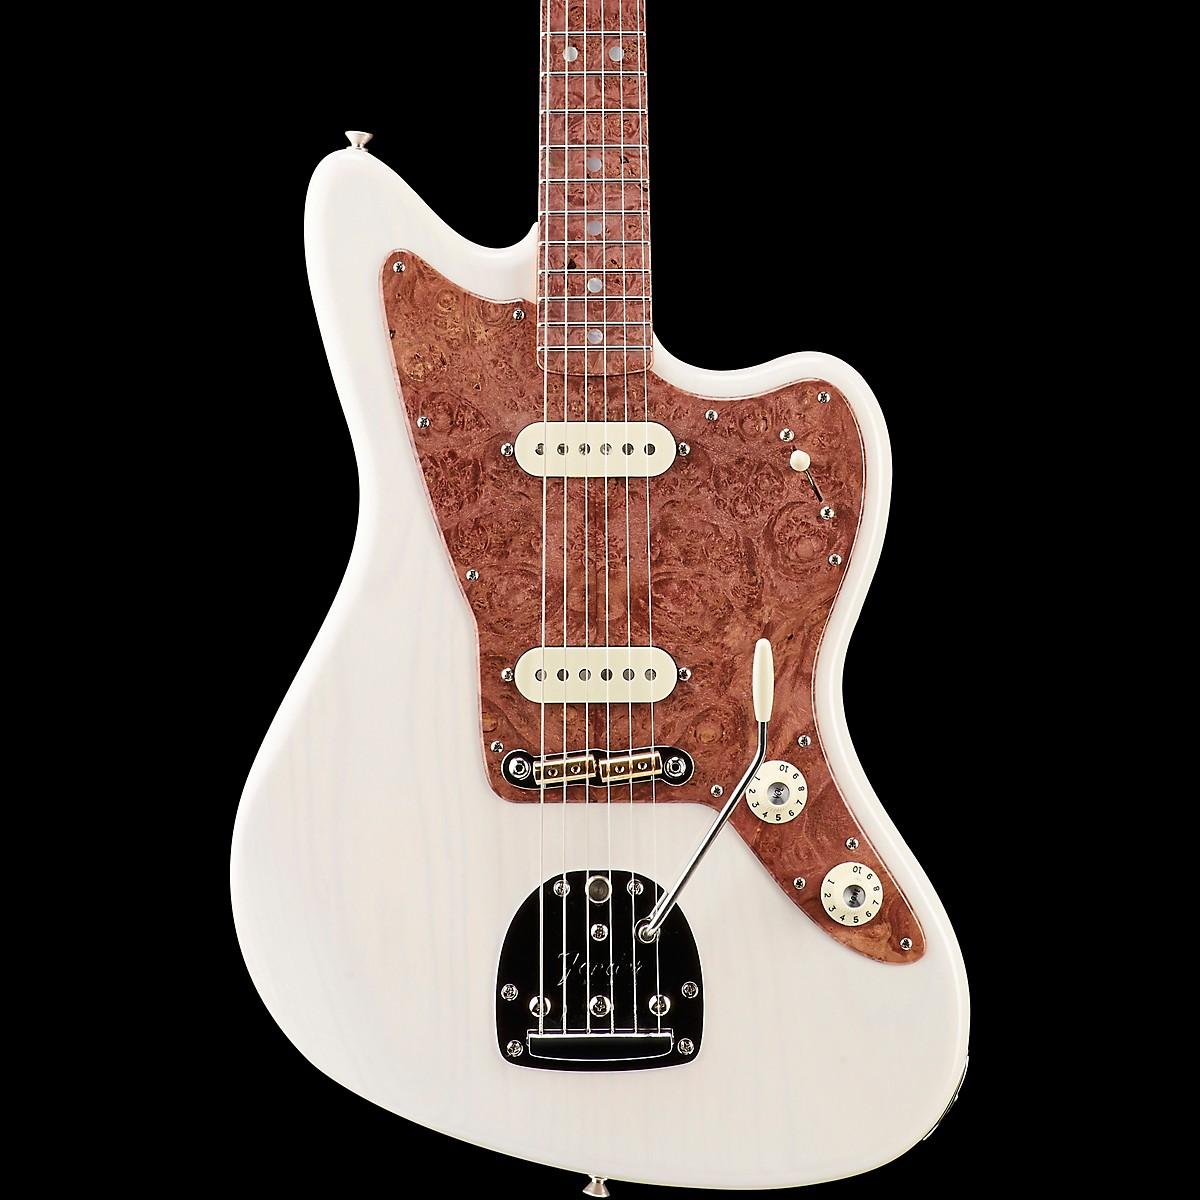 Fender Custom Shop Founders Design Jazzmaster Designed By George Blanda